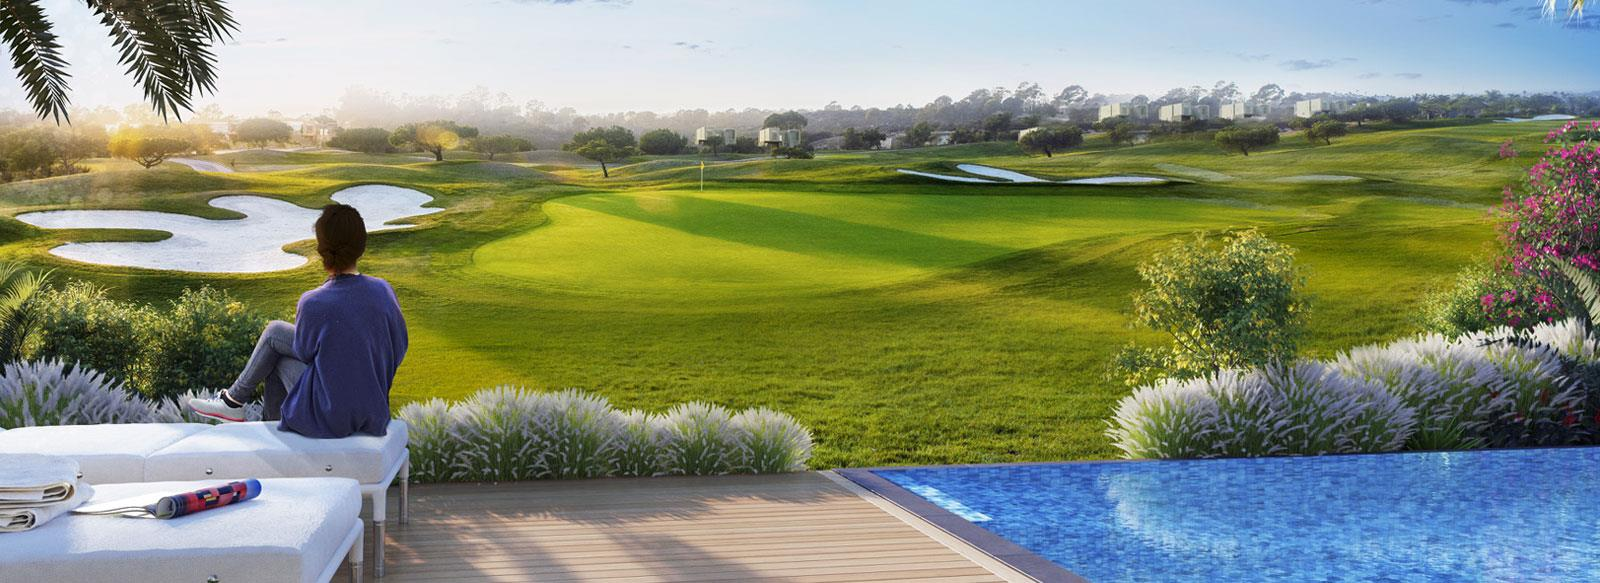 Golf Links Views